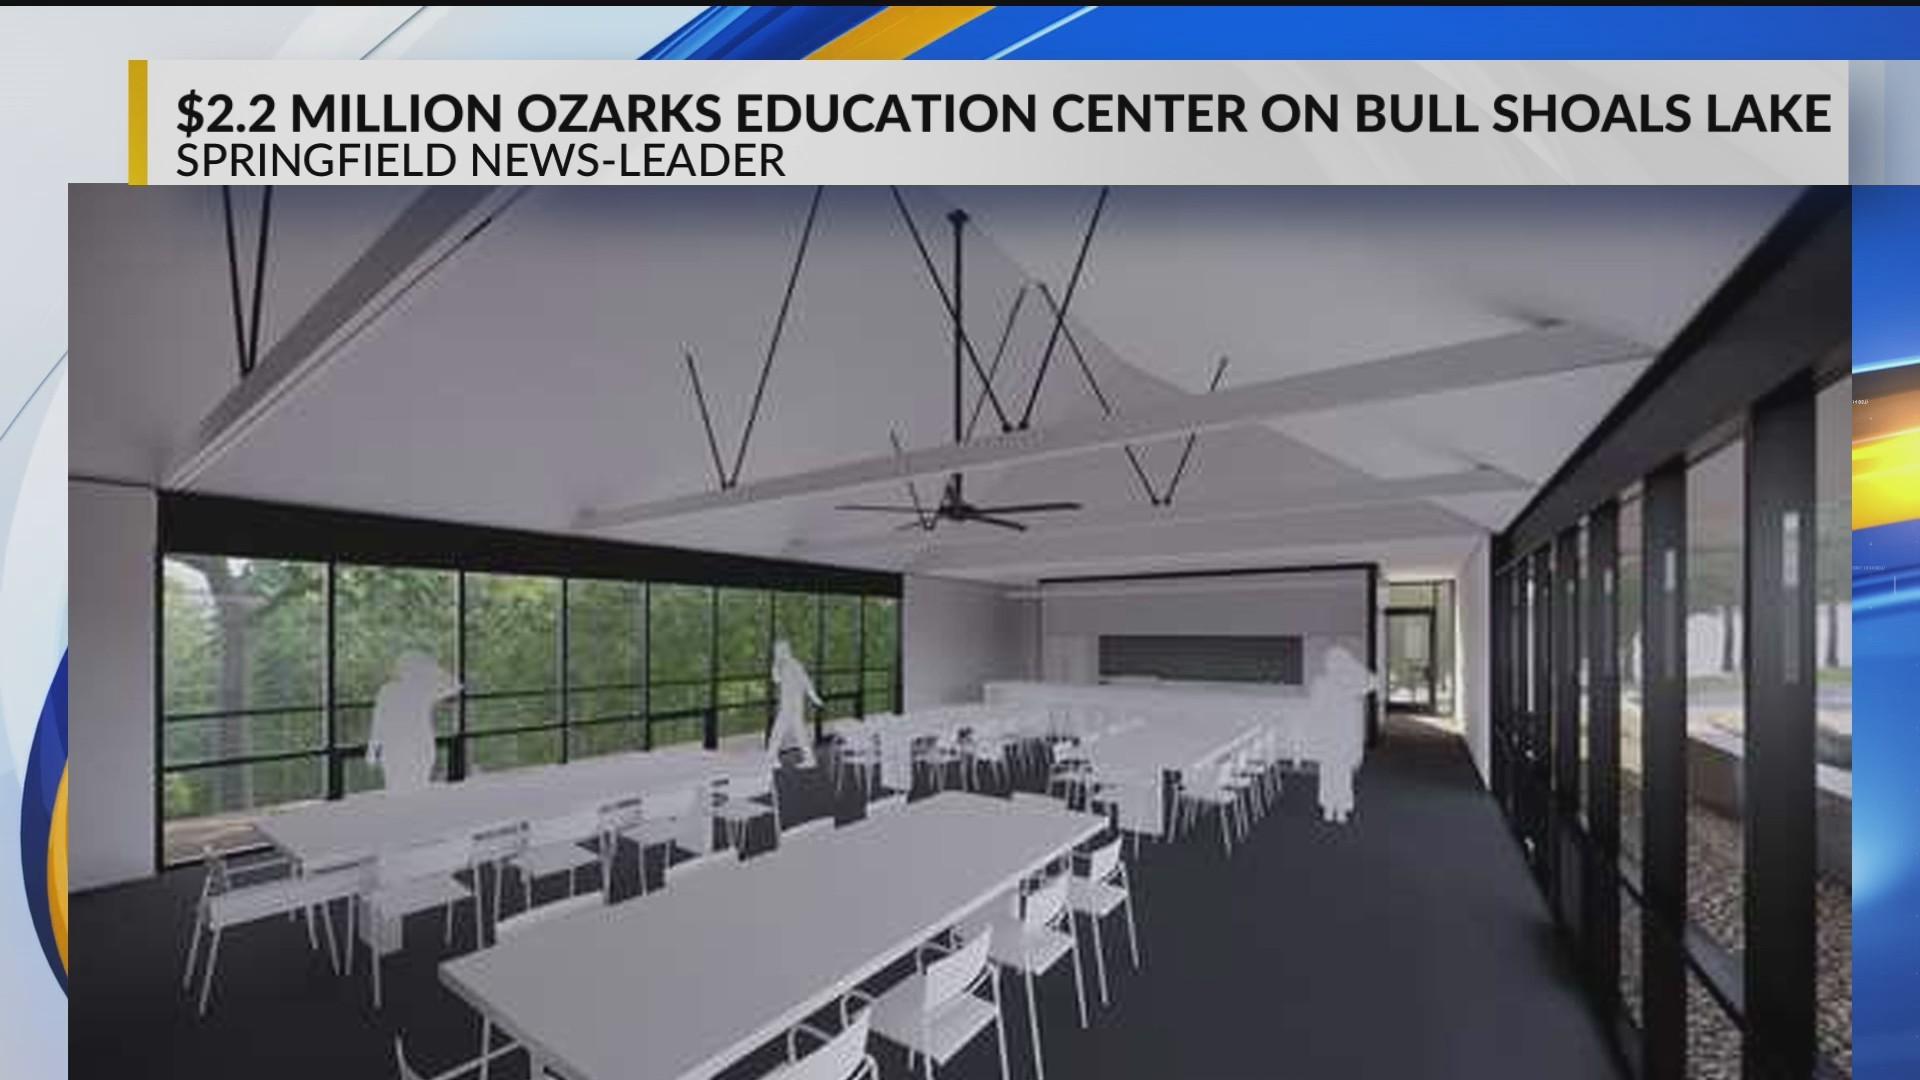 $2 2 million Ozarks Education Center to be built at Bull